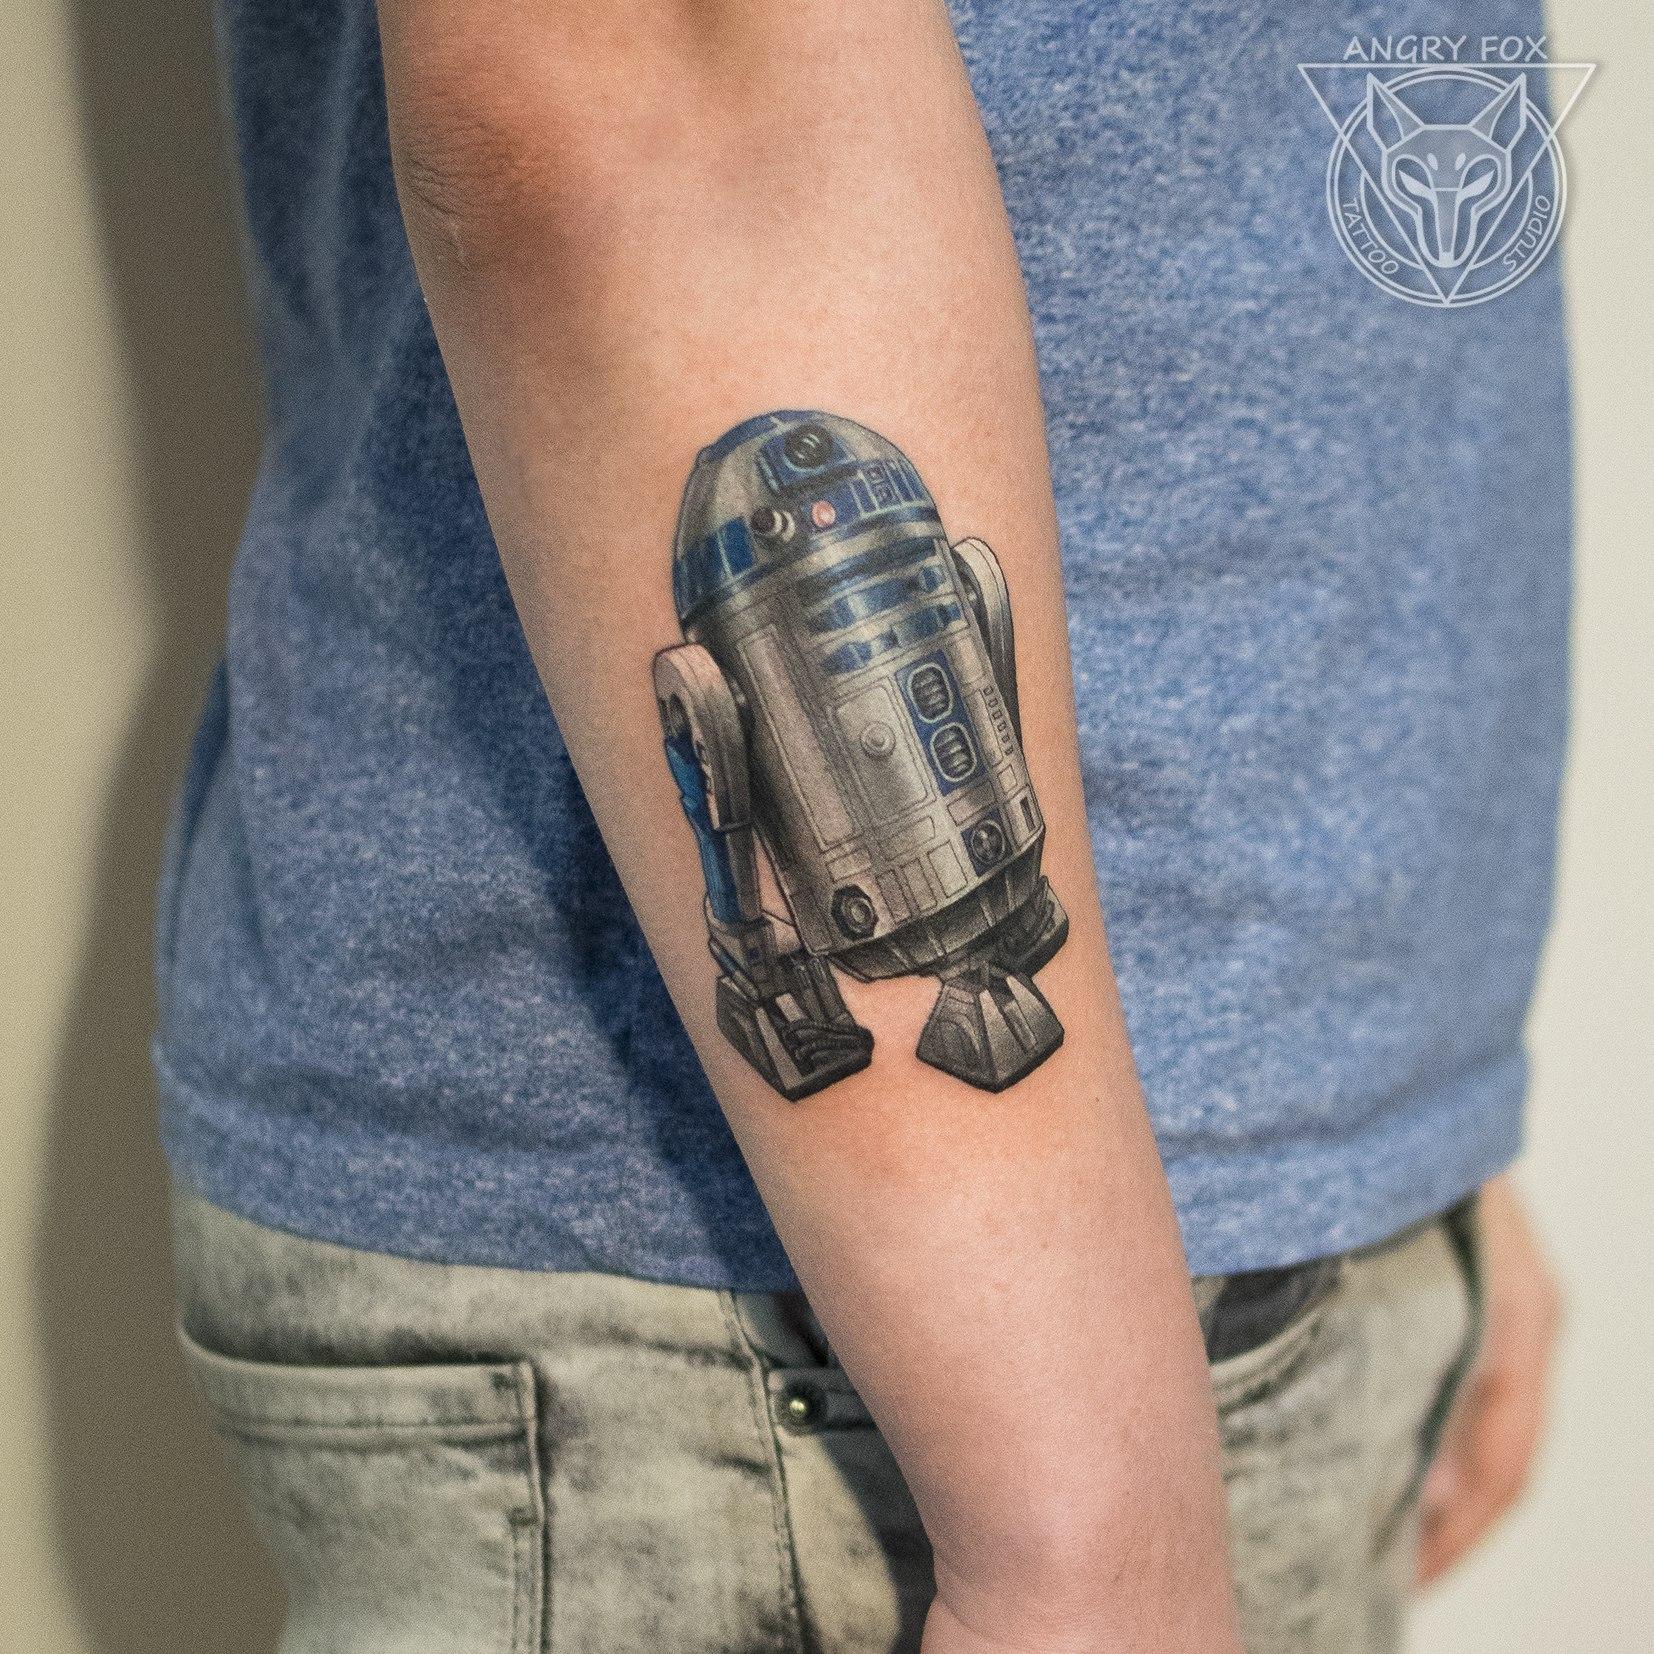 Татуировка, тату, рука, дроид, r2d2, R2-D2, р2д2, звездные воины, star wars, старварс, реализм